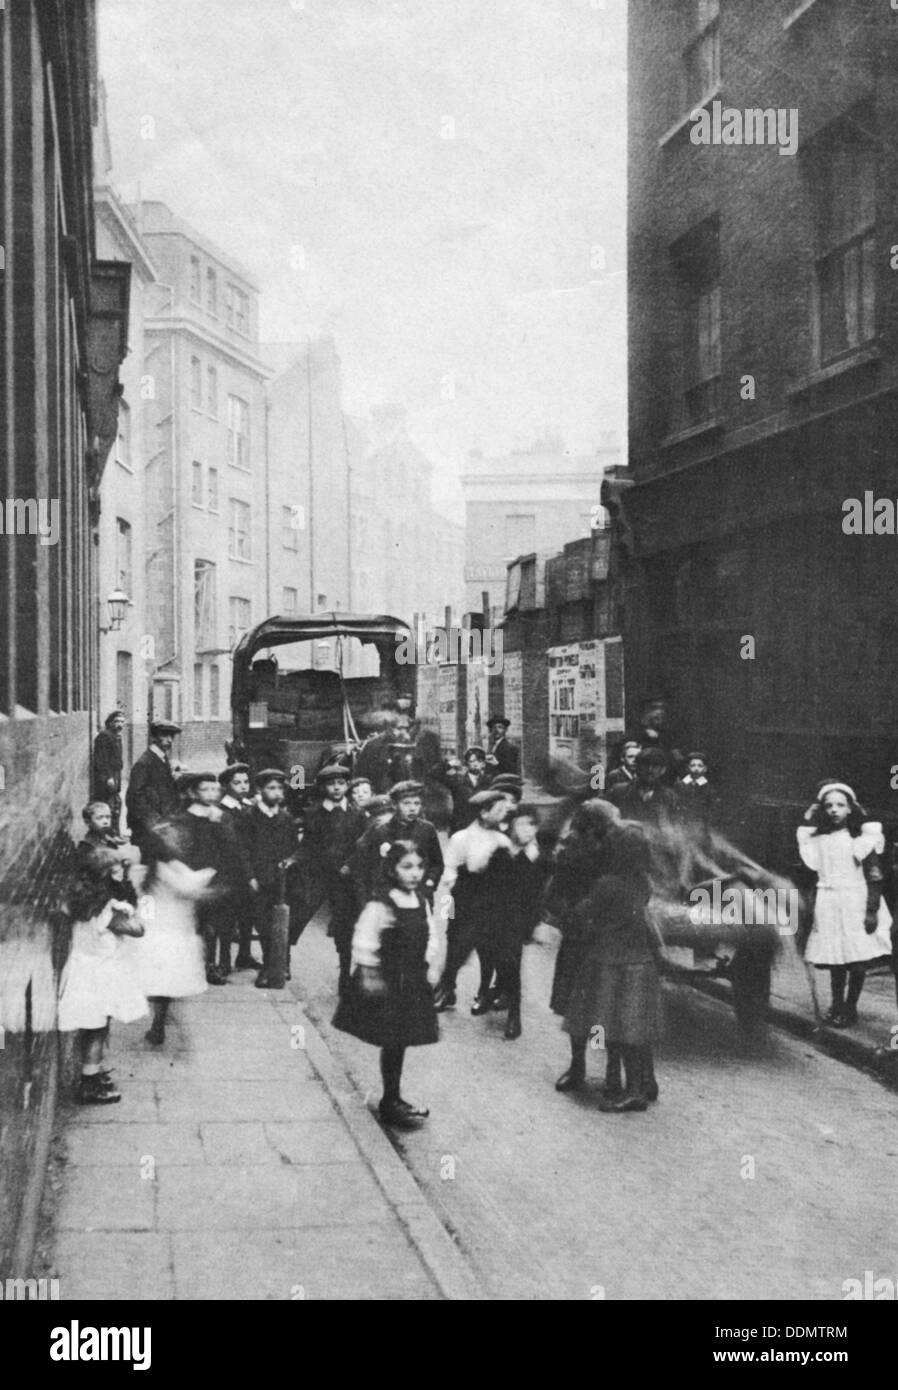 East End street scene, London, 1912. - Stock Image